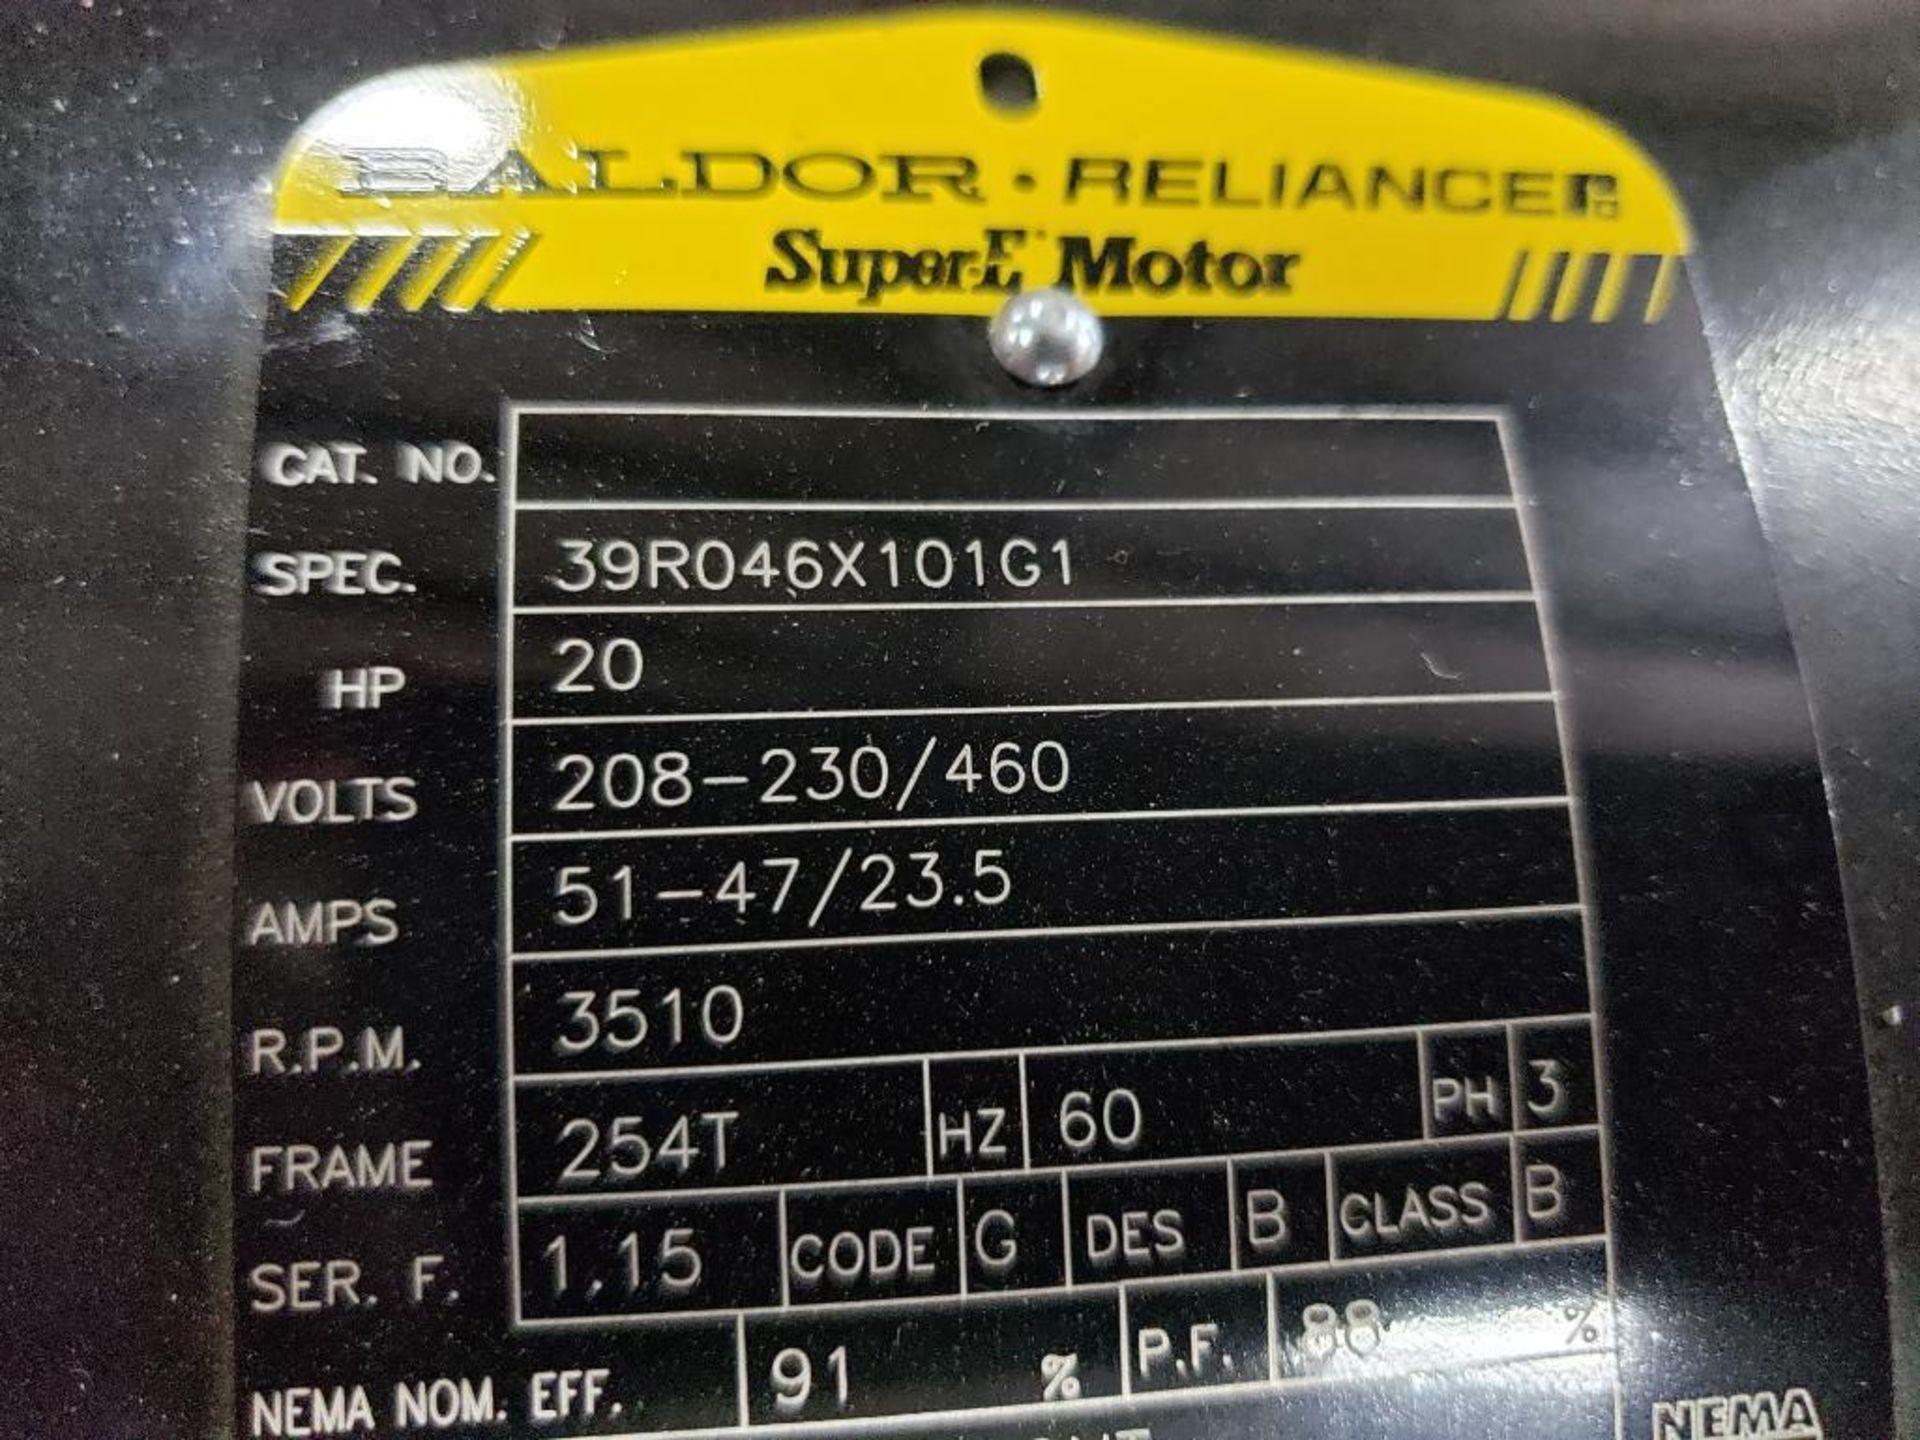 20HP Baldor Reliance 3PH SuperE Motor. 39R046X101G1. 208-230/460V, 3510RPM, 254T-Frame. - Image 4 of 7